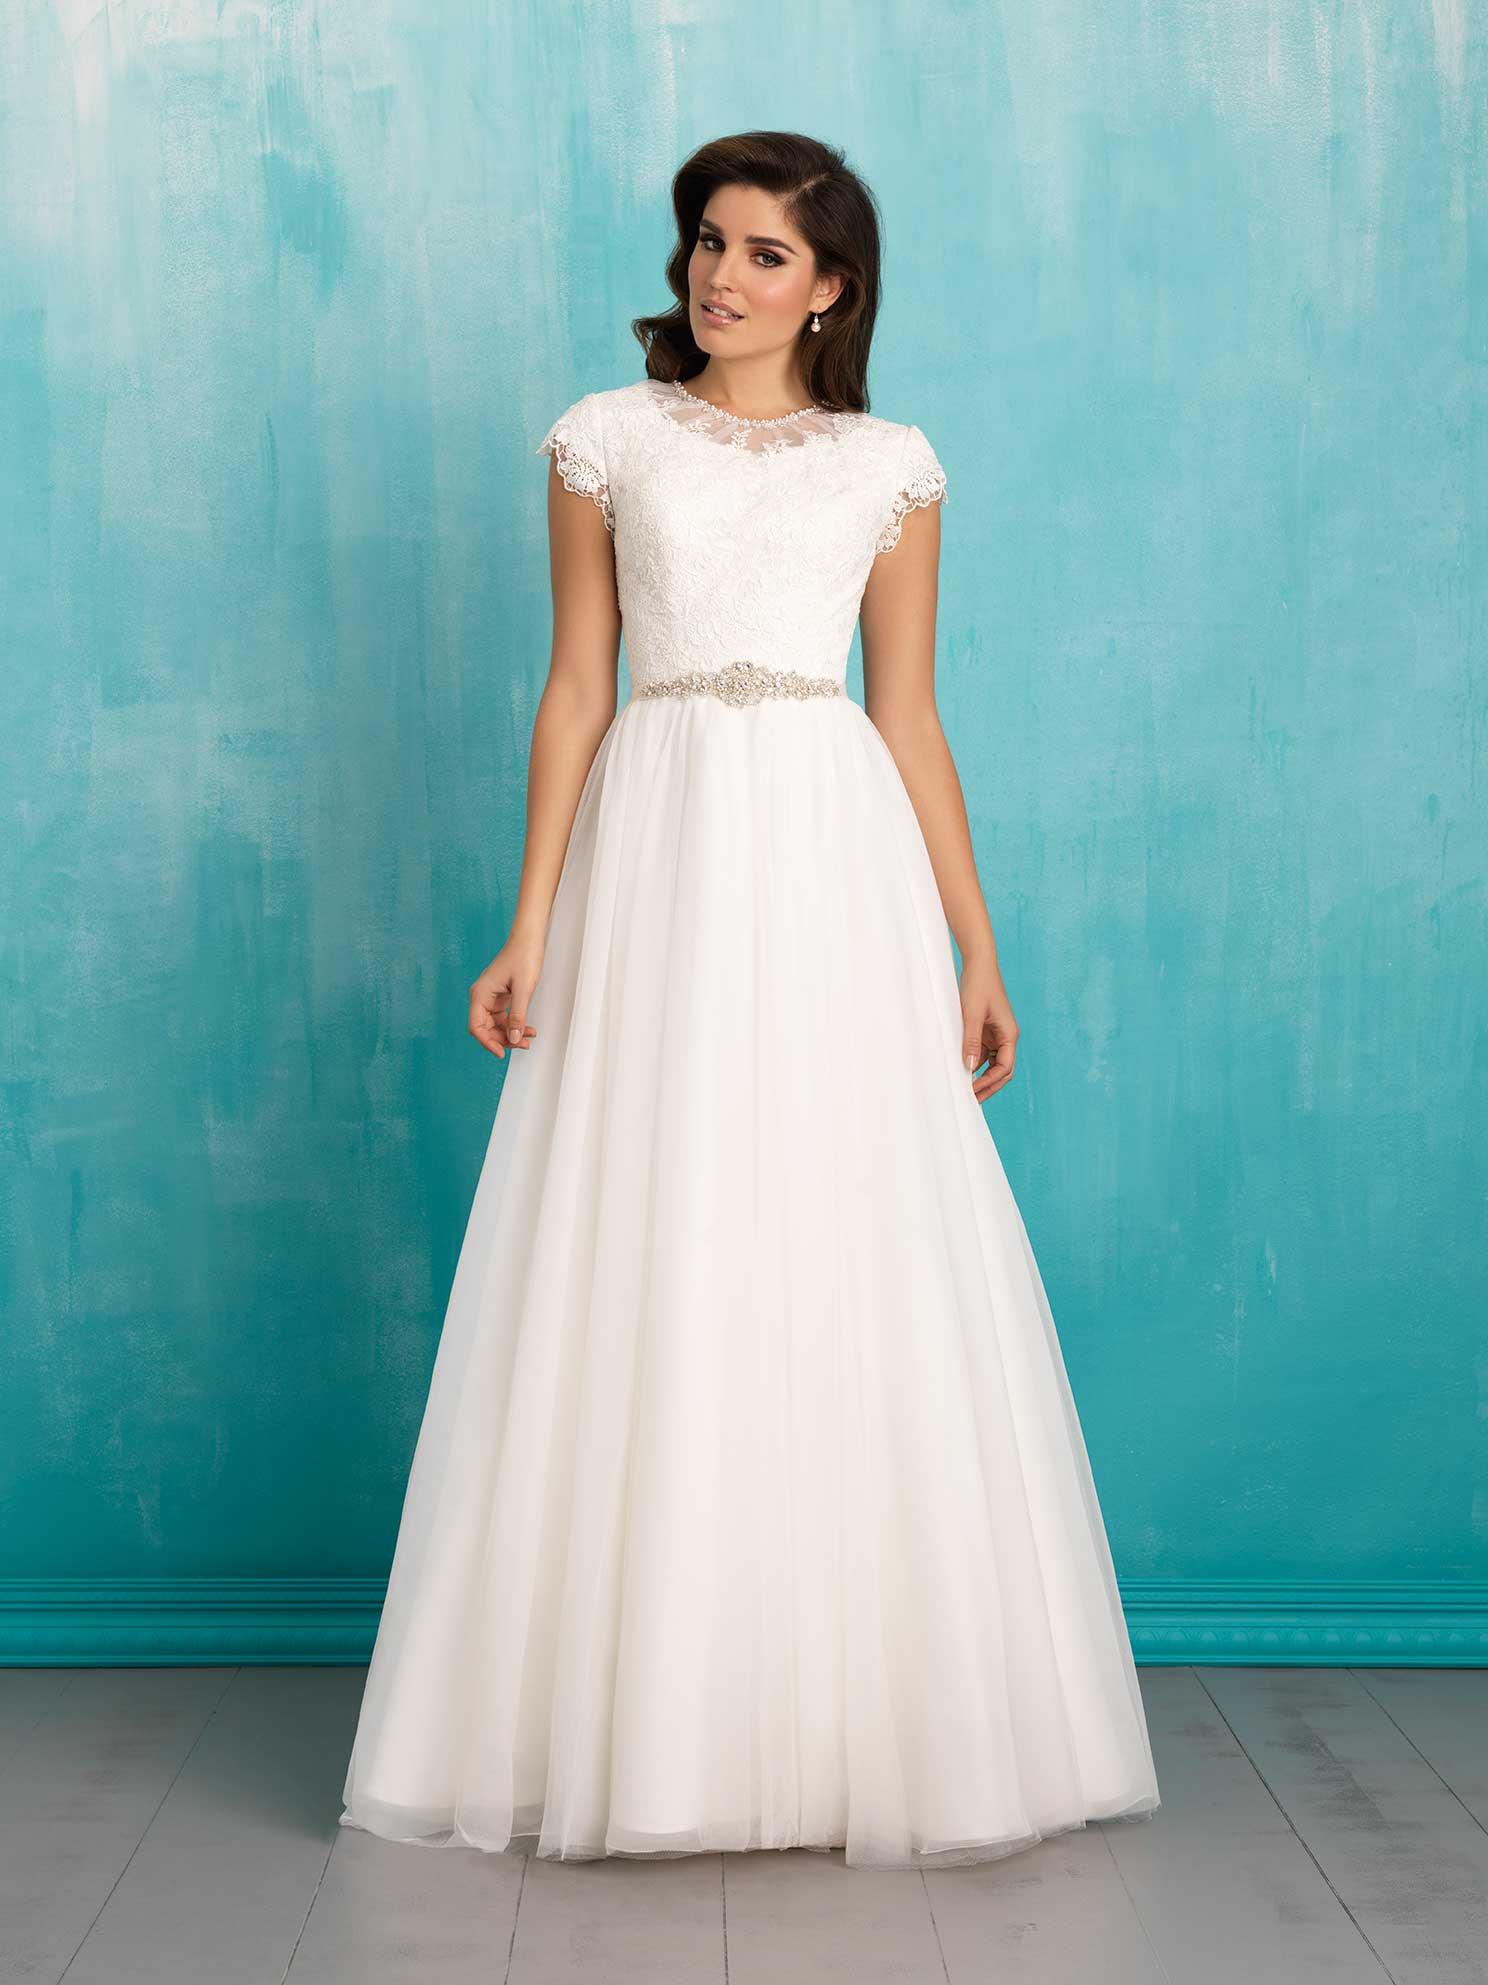 scoop back wedding dresses photo - 1